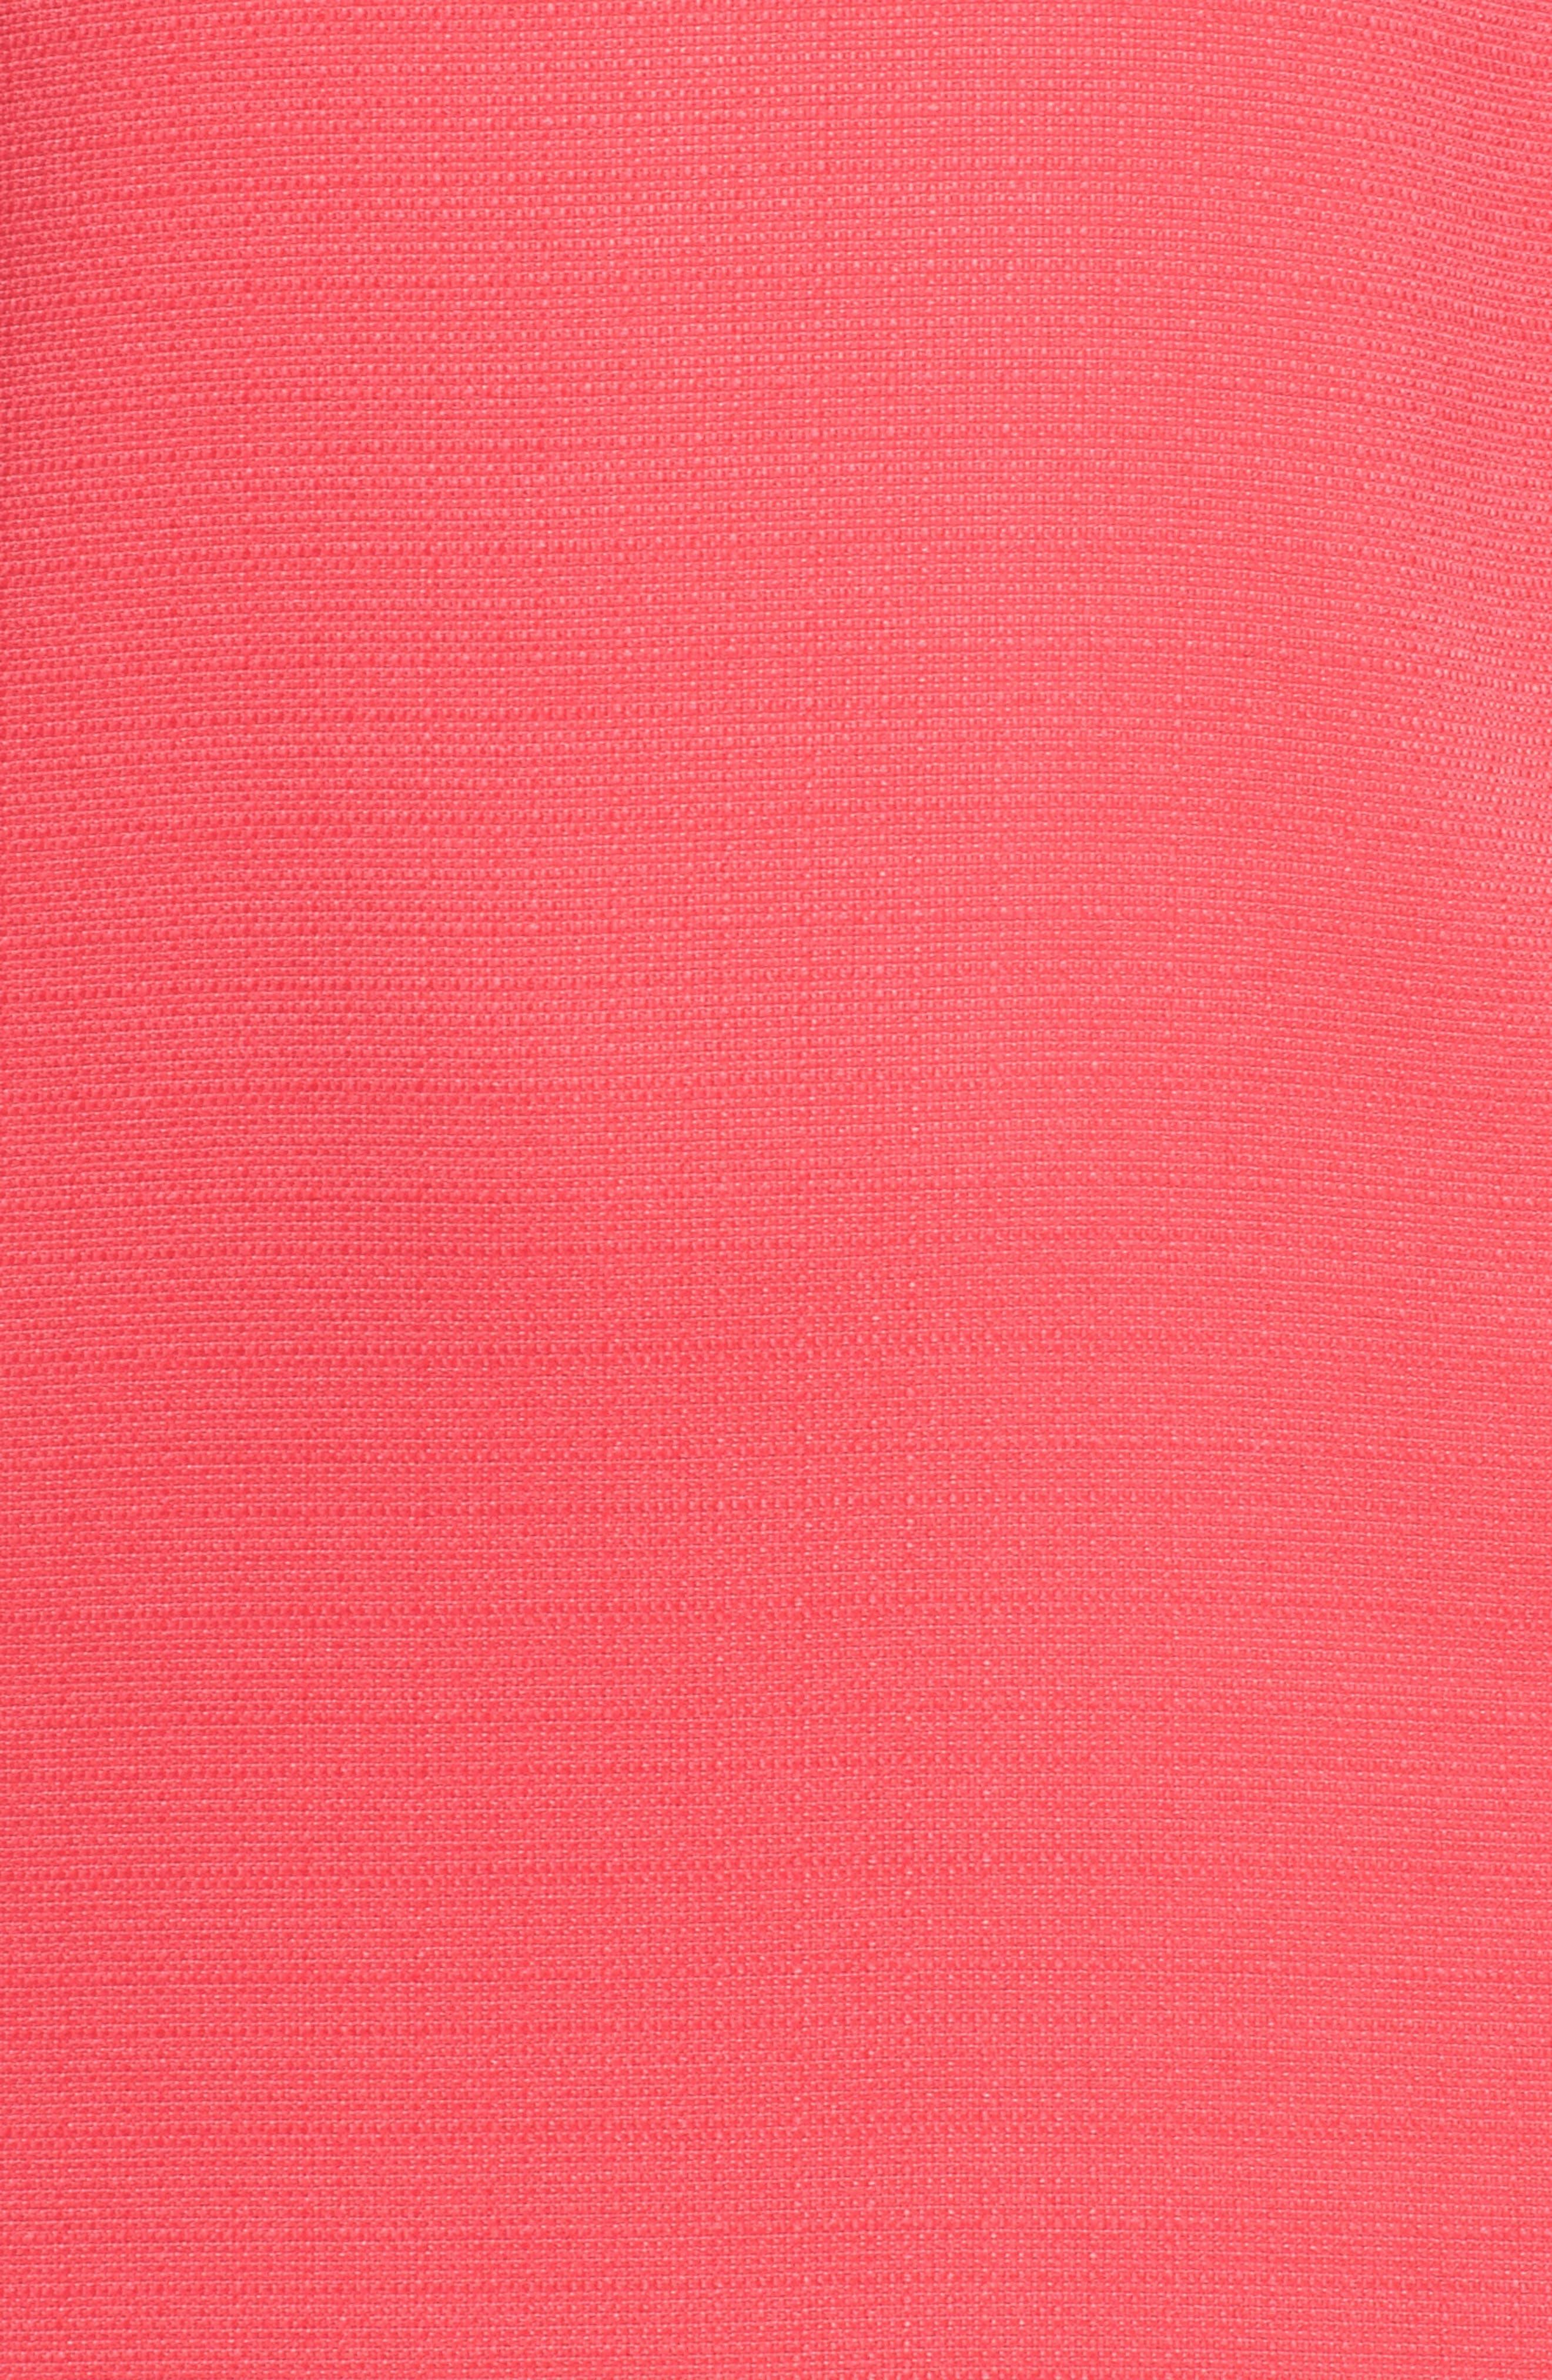 Puff Sleeve Shift Dress,                             Alternate thumbnail 12, color,